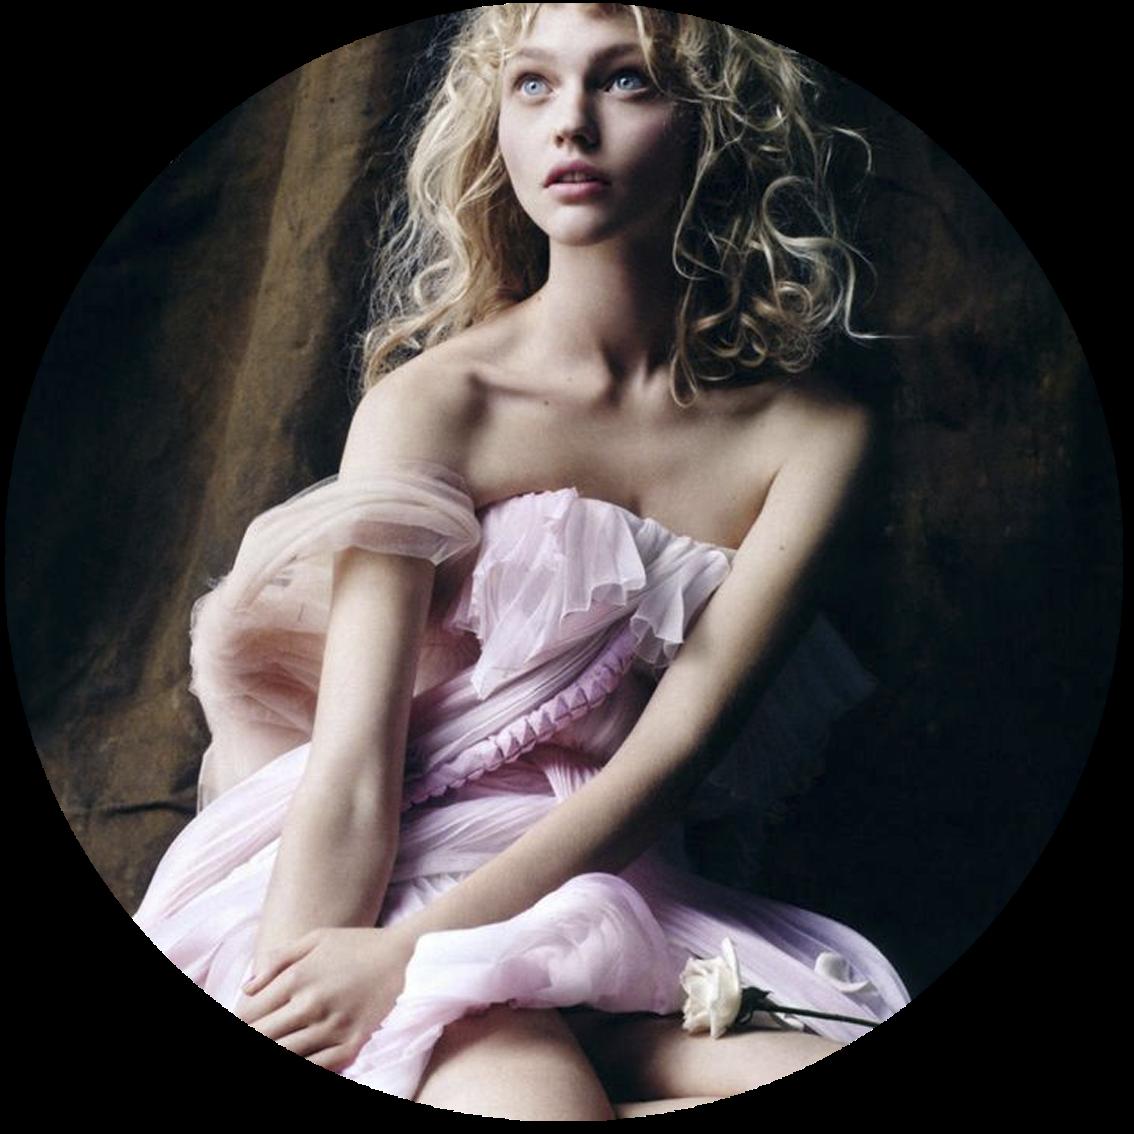 blog de arte moderno cuadros de mujeres